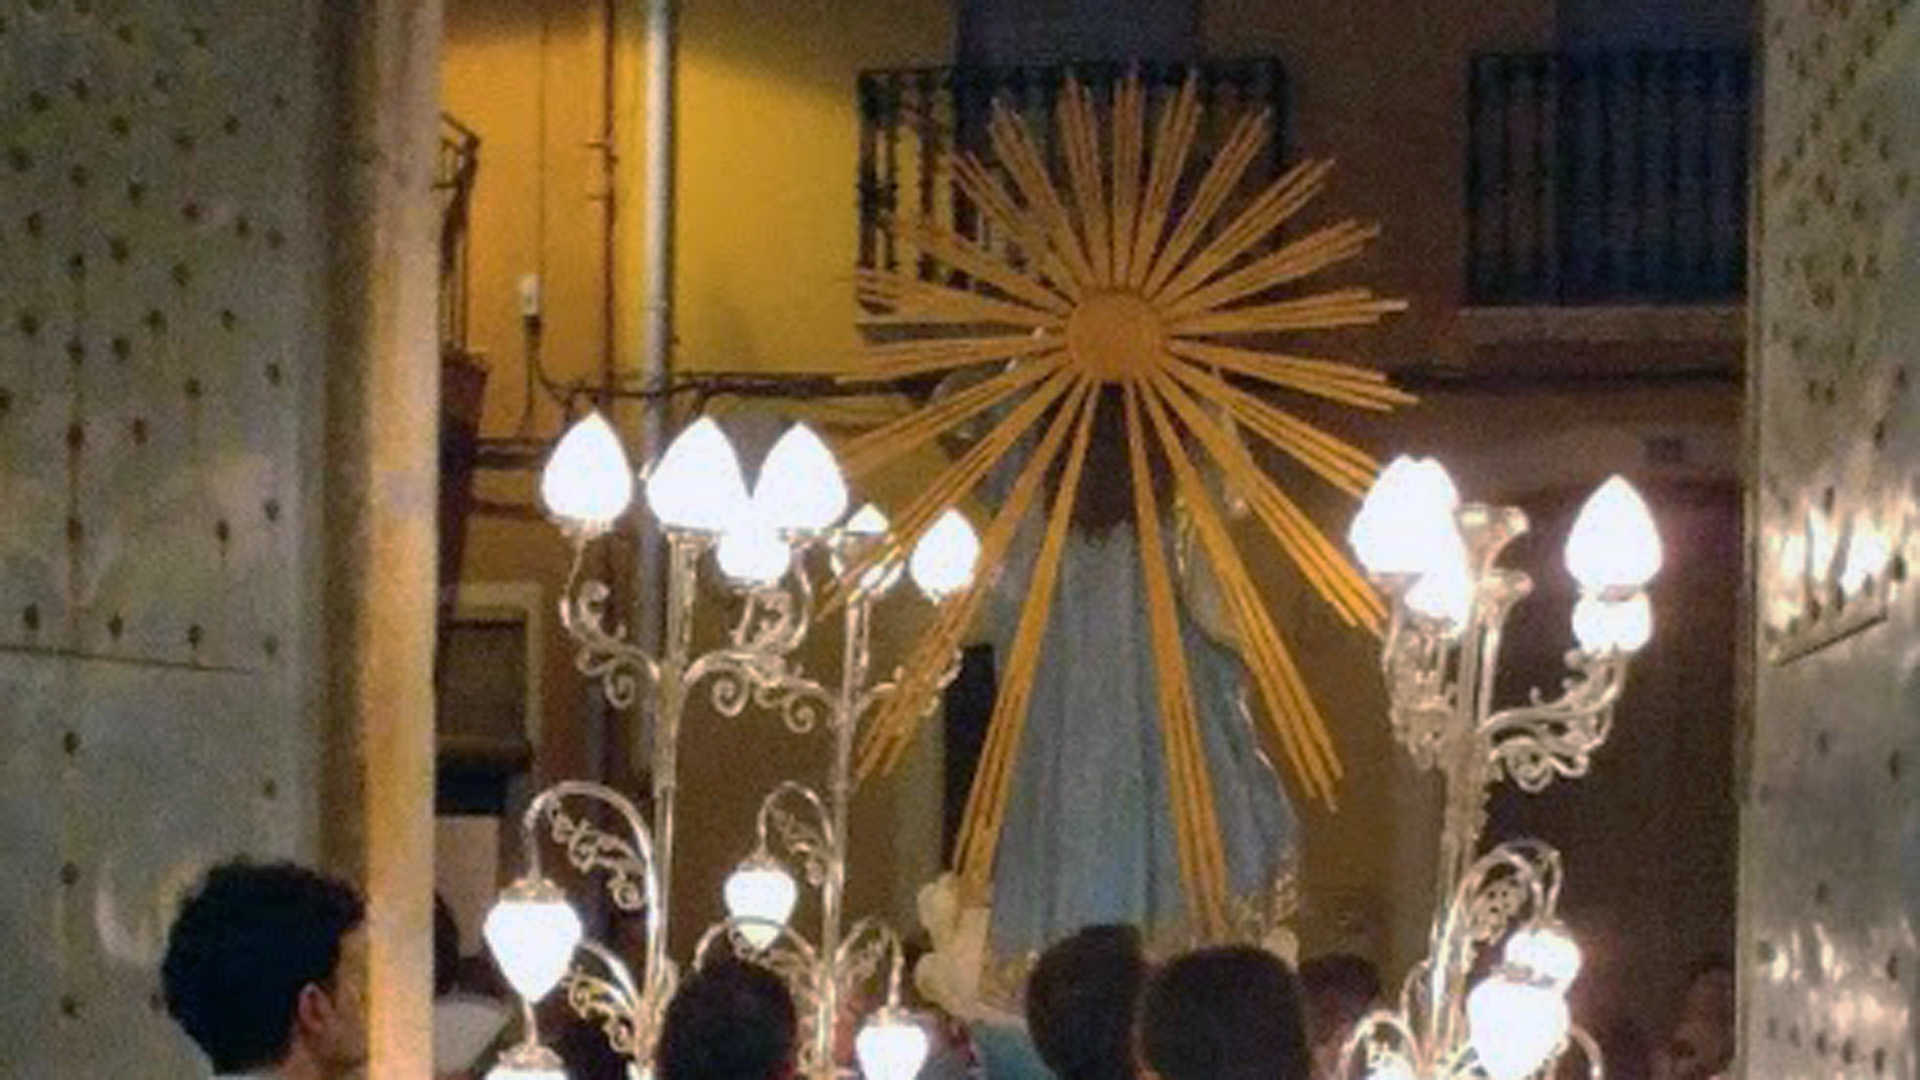 FESTIVITIES IN HONOUR  OF SAN SEBASTIÁN, CRISTO DEL CONSUELO AND LA PURÍSIMA